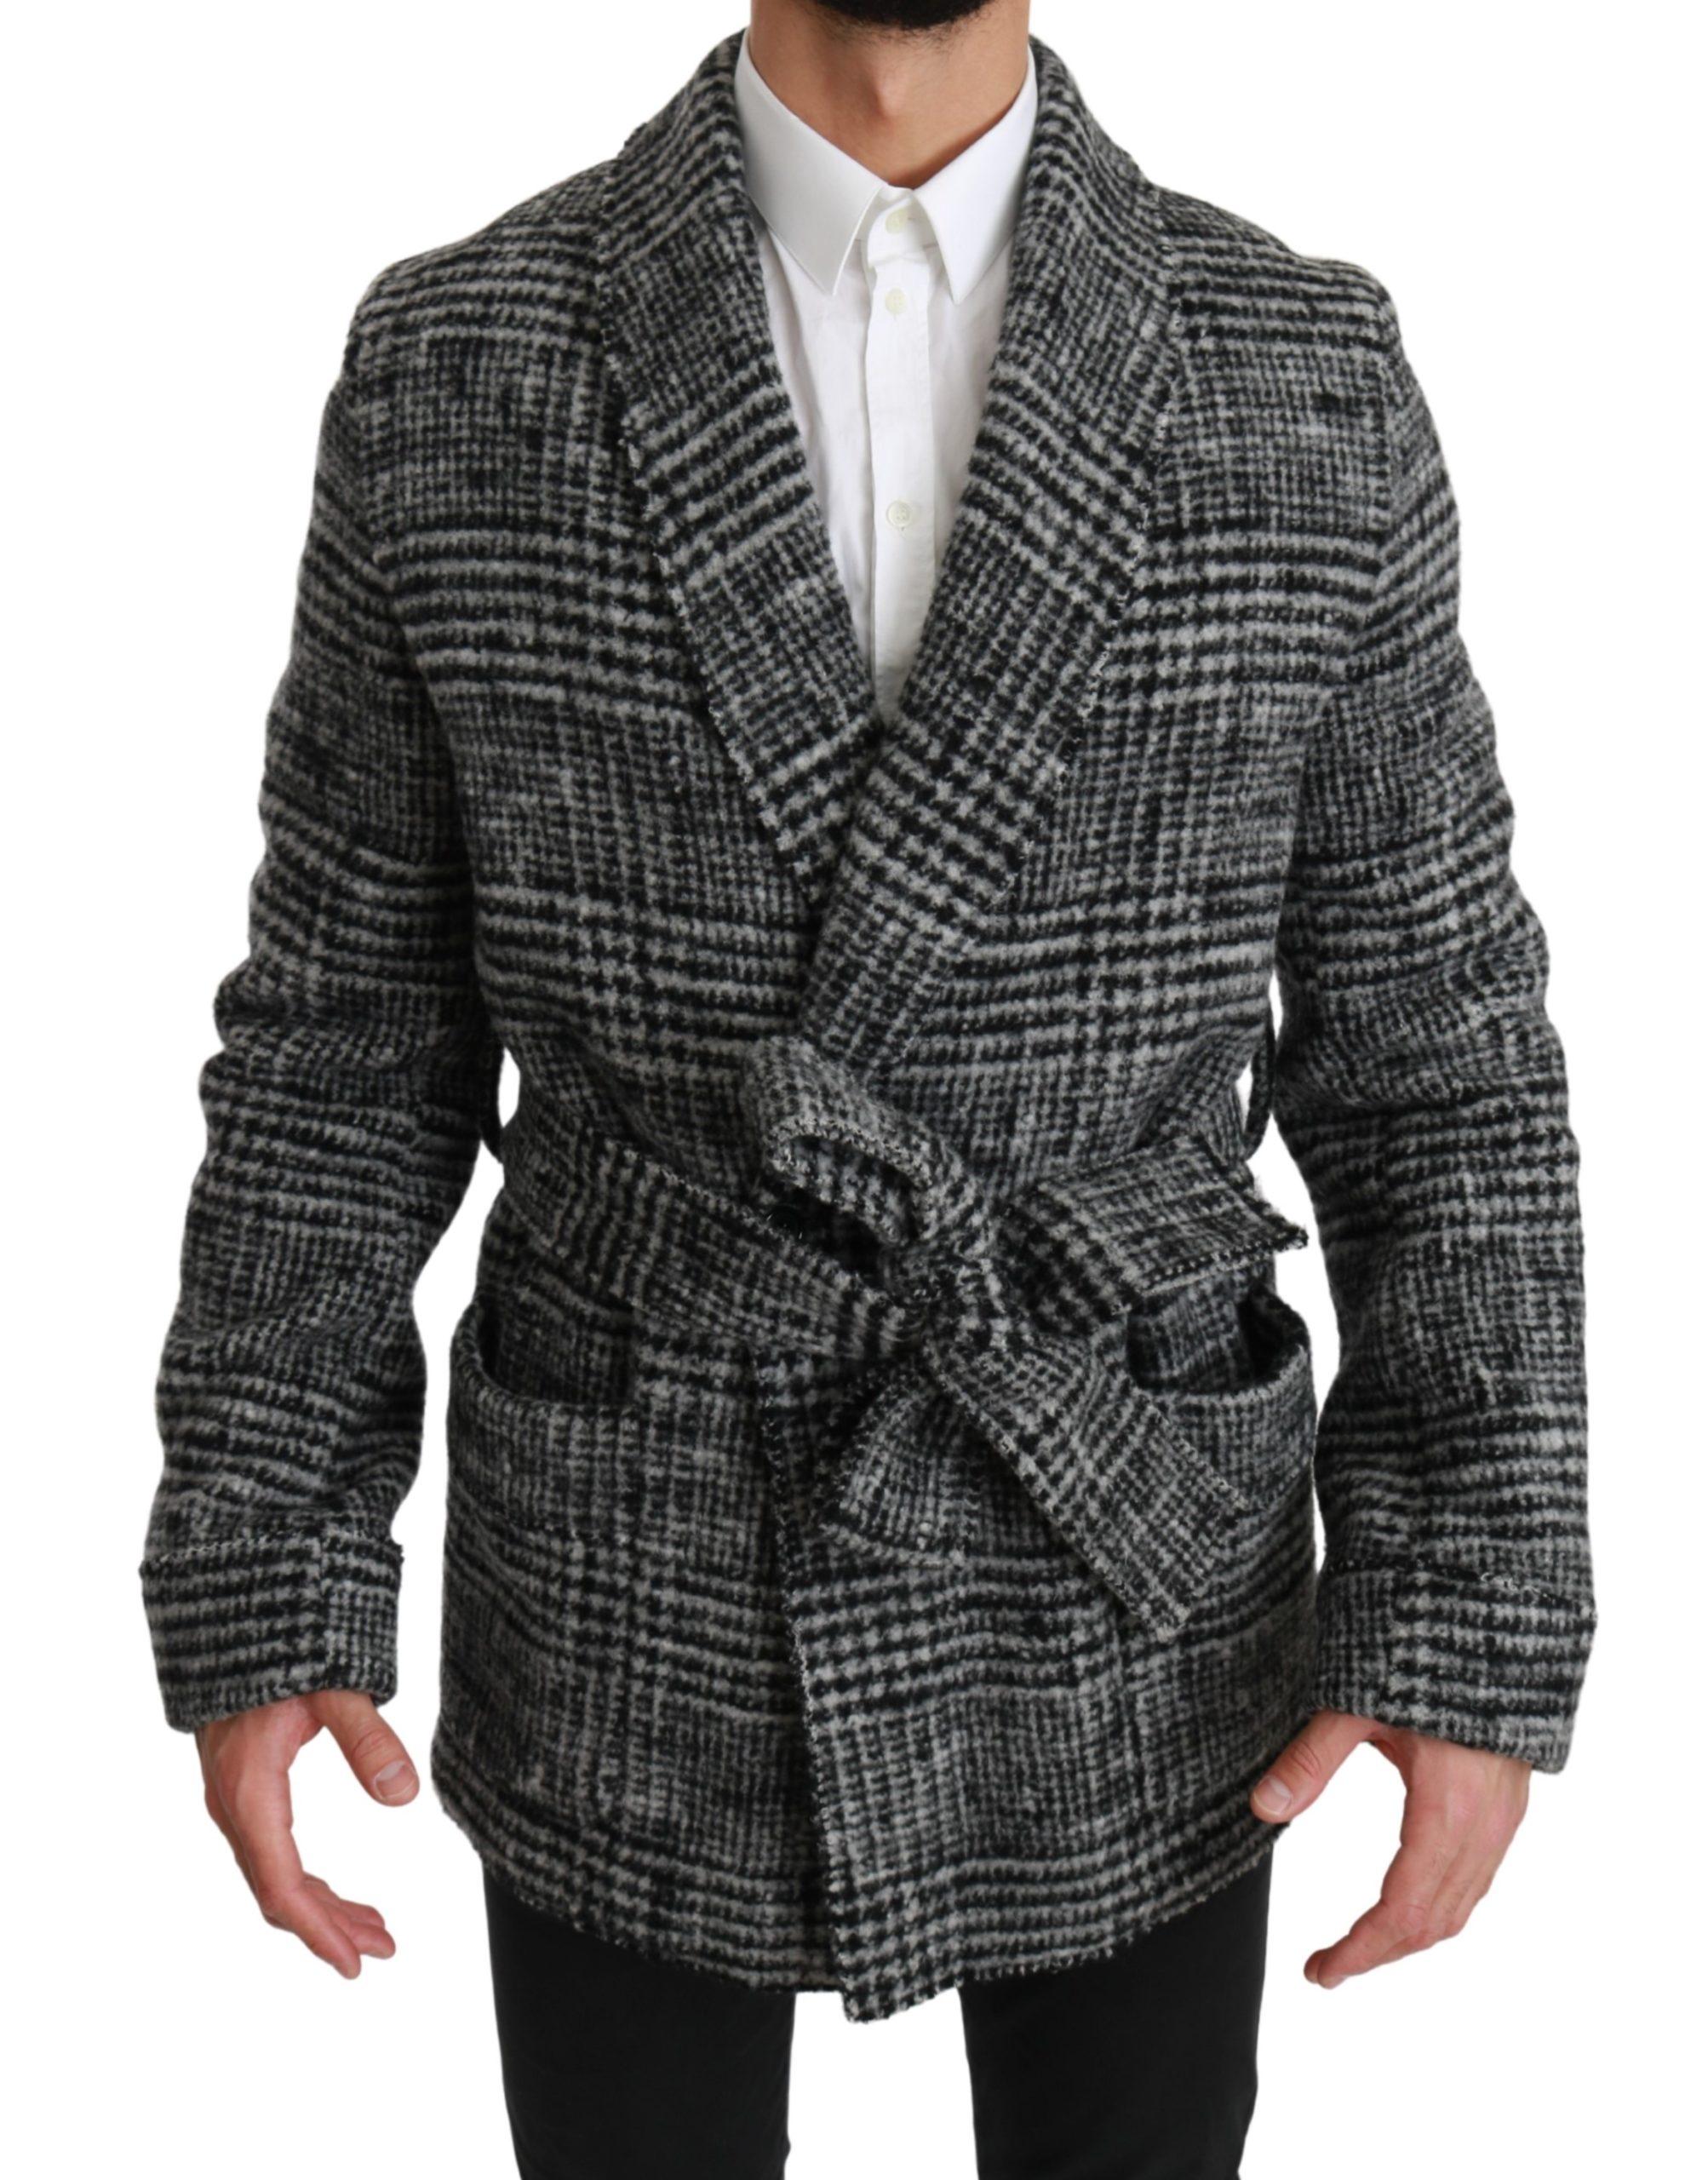 Dolce & Gabbana Men's Checkered Wool Robe Coat Wrap Jacket Gray JKT2489 - IT48 | M